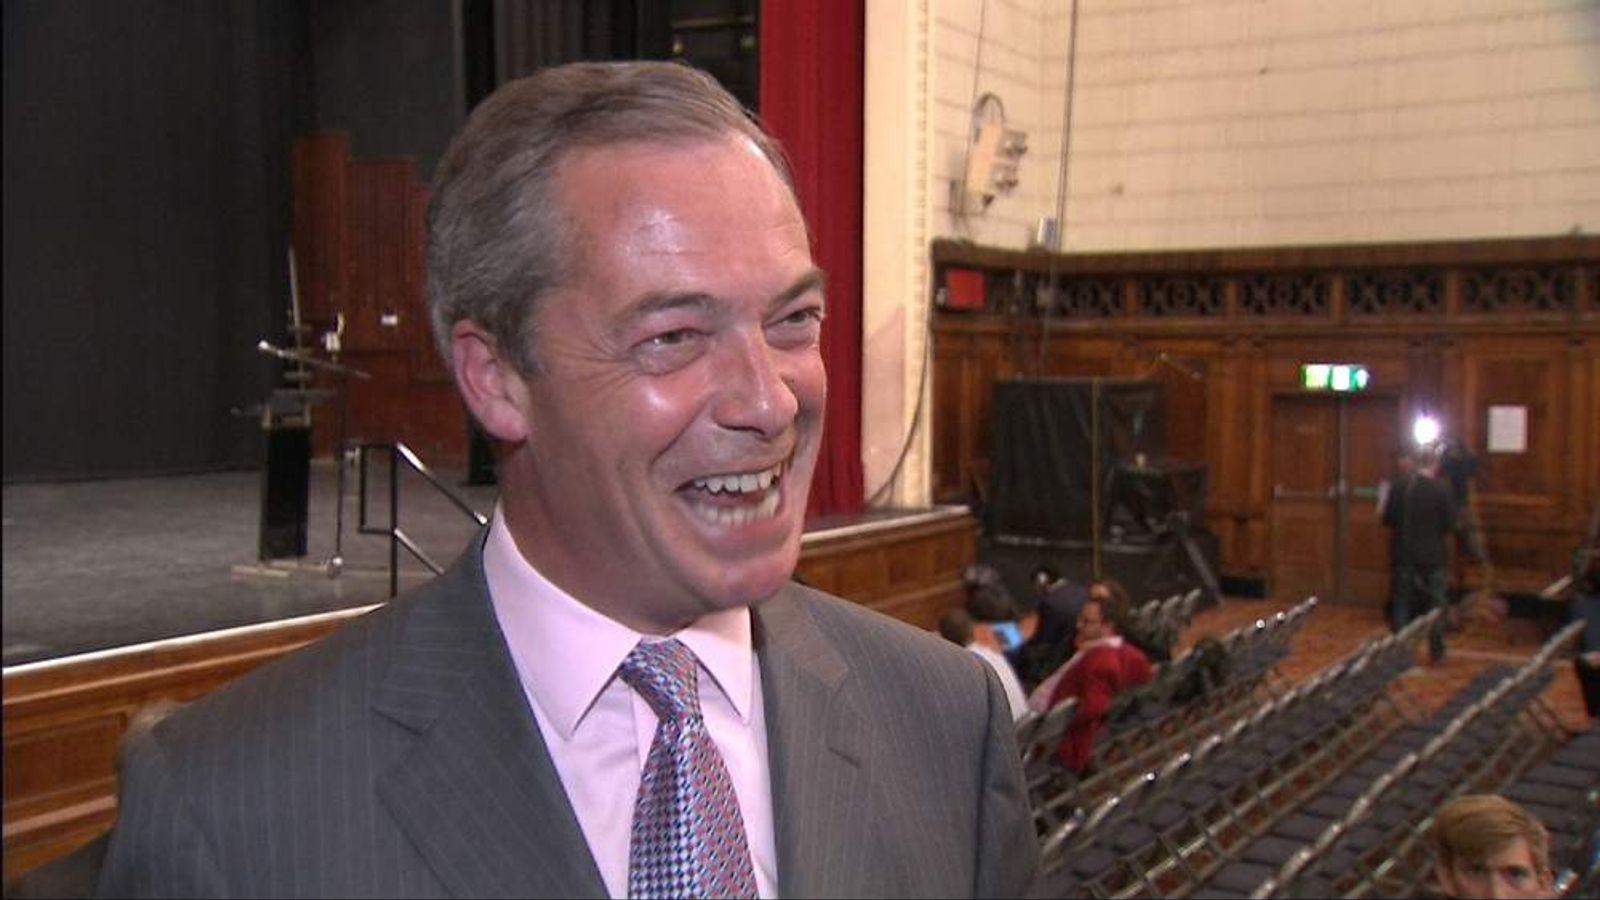 Nigel Farage MEP